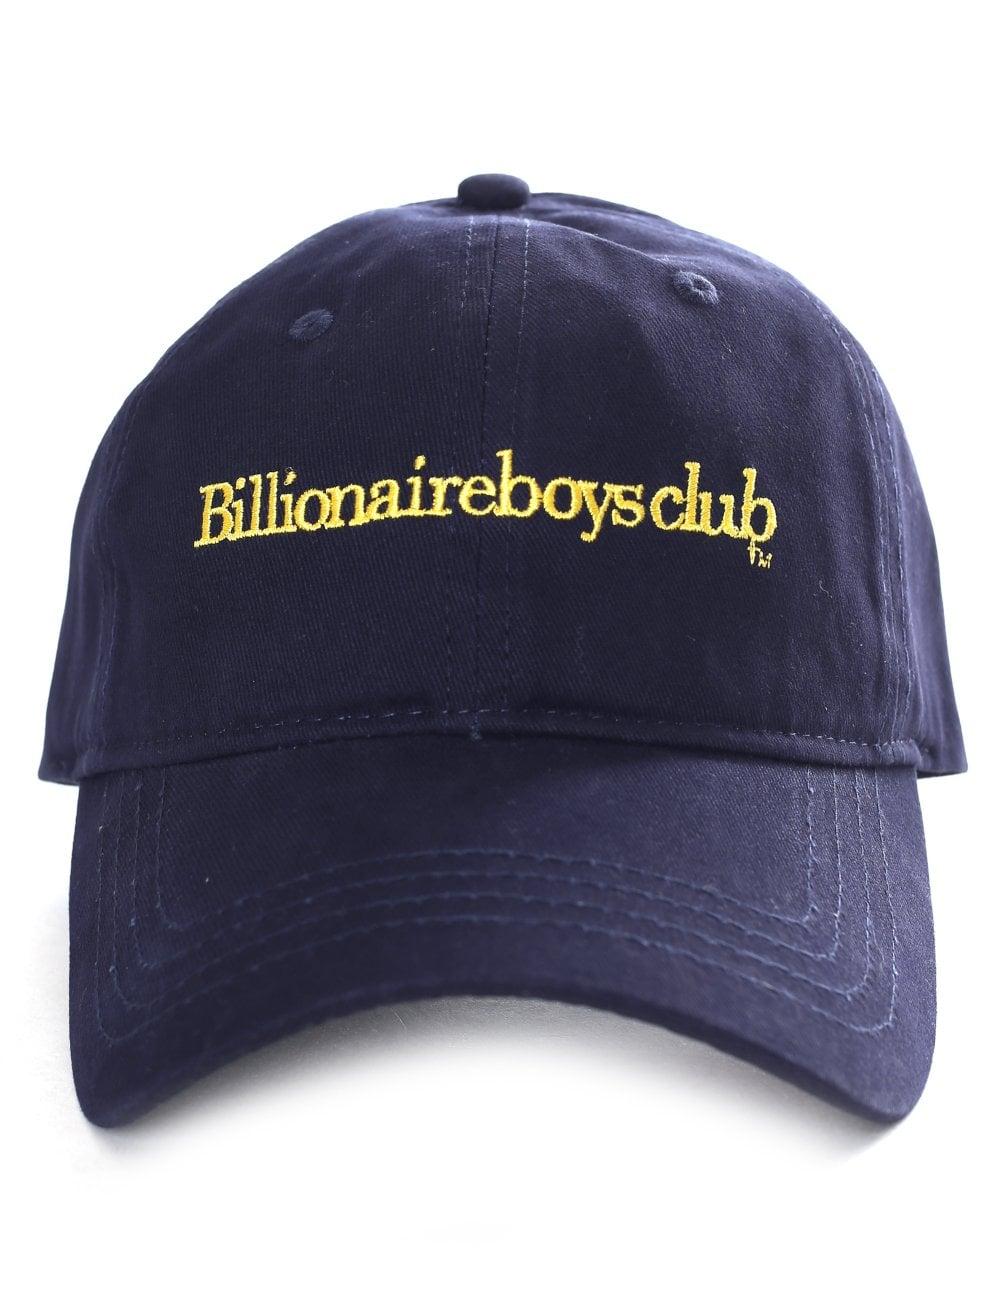 2d7095361 Billionaire Boys Club Men's Embroidered Curved Visor Cap